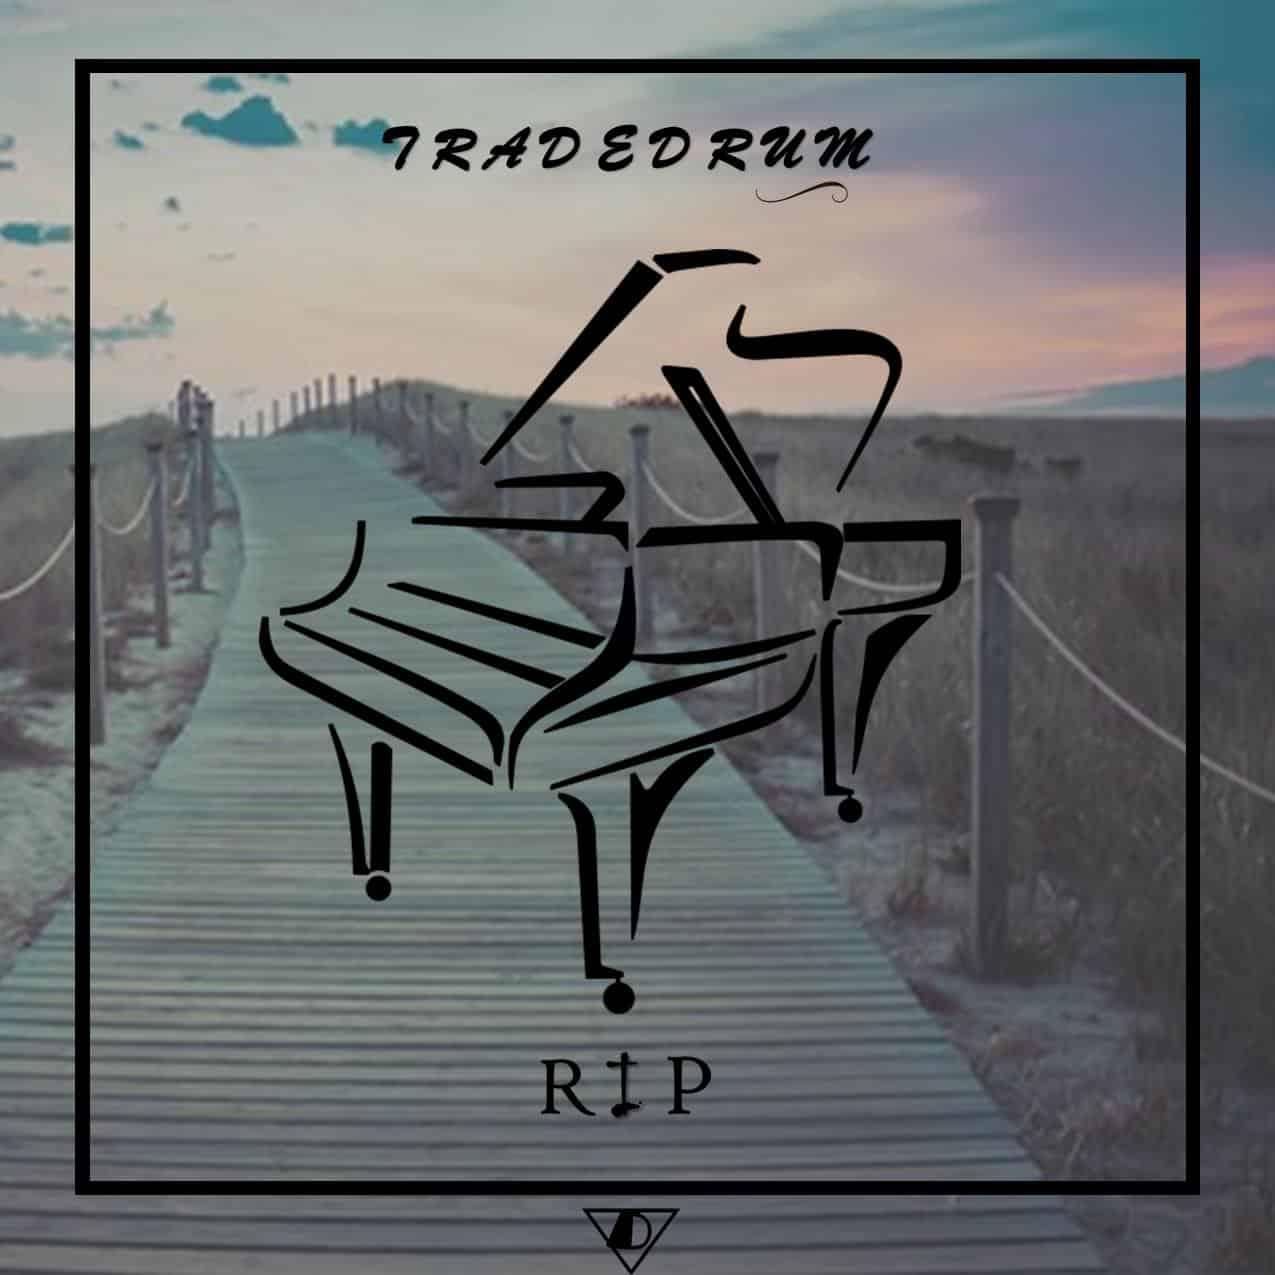 Tradedrum - RIP